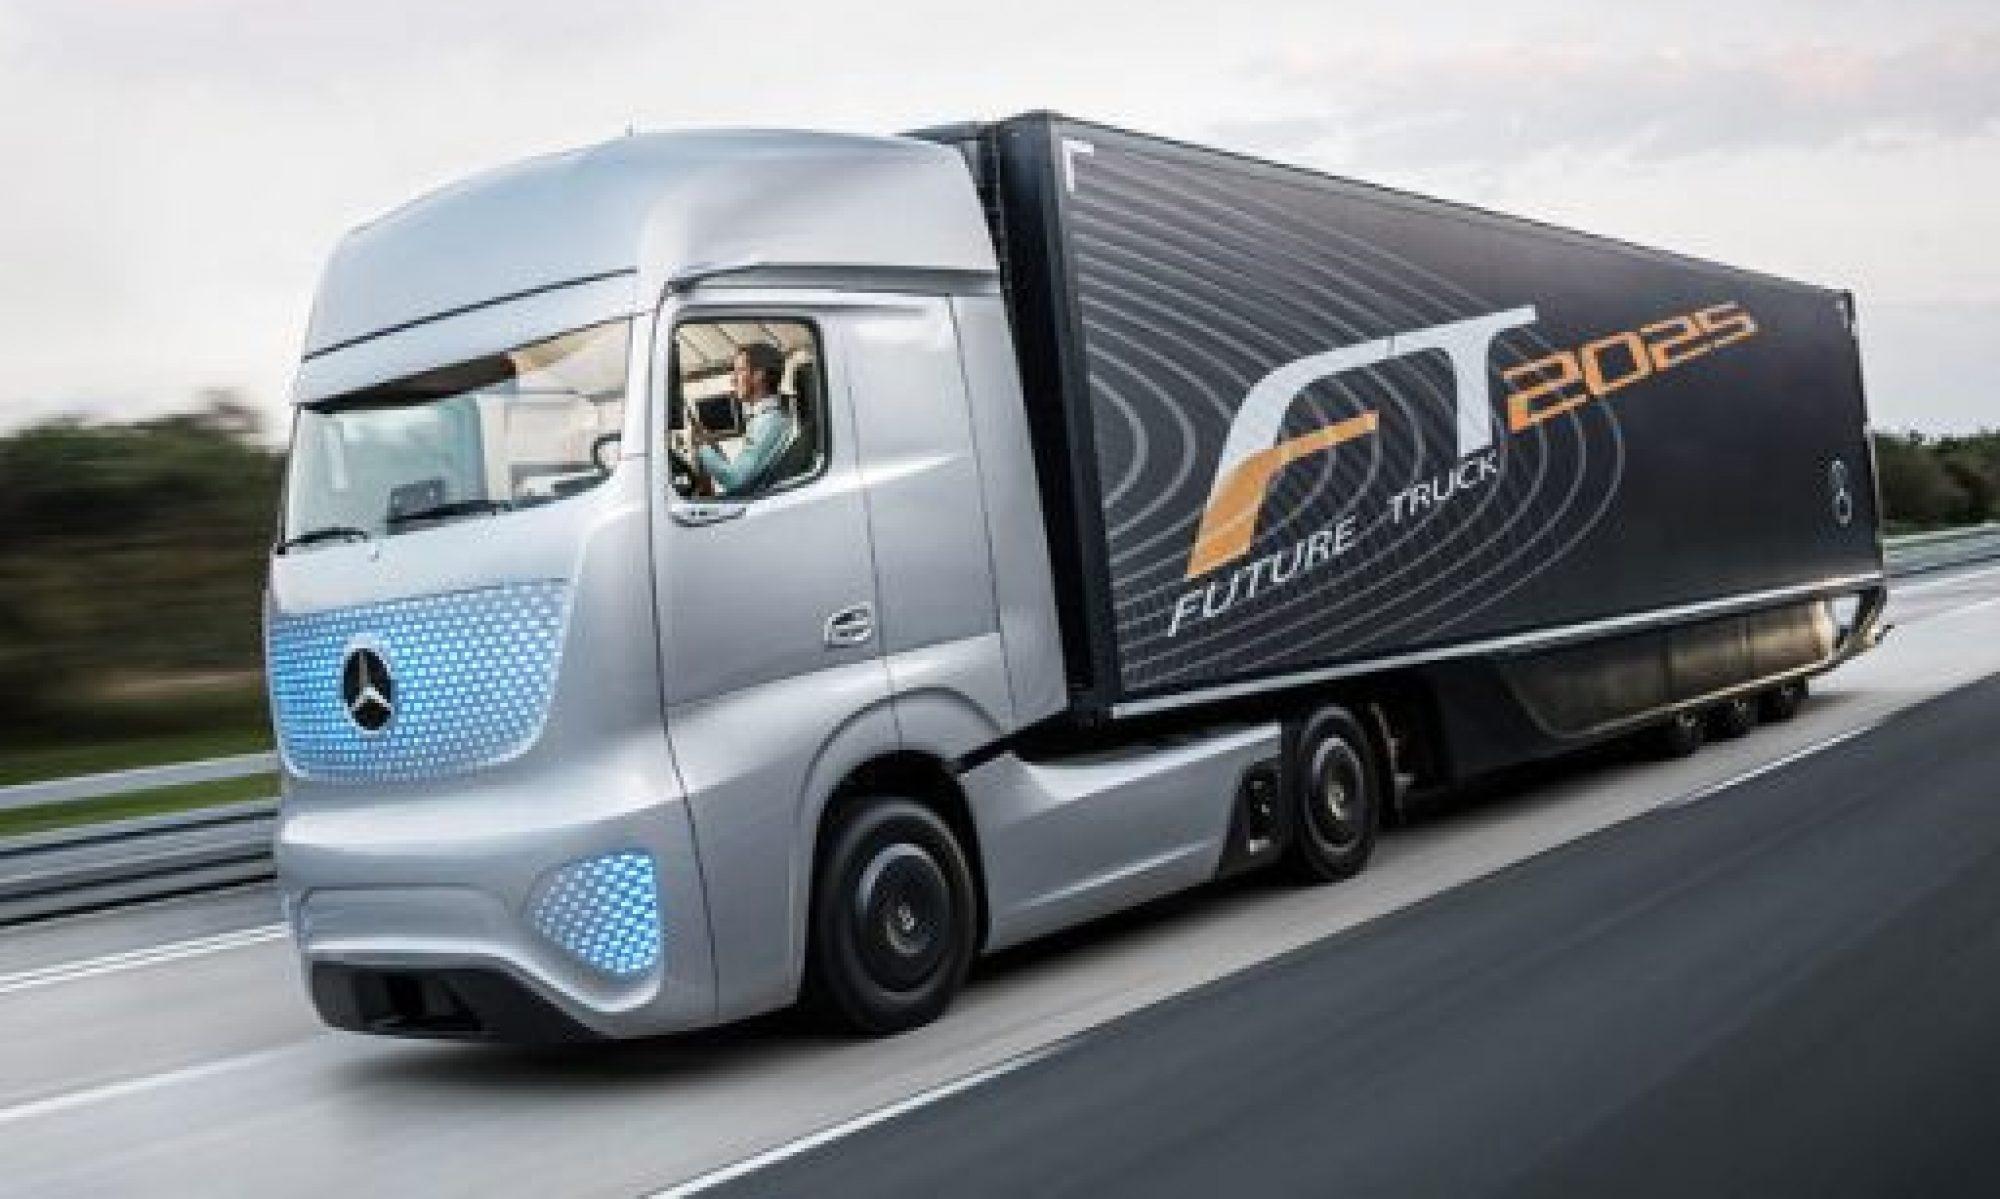 cropped-cropped-01-Mercedes-Benz-Autonomous-Truck-Logistic-Future-Truck-2025-1180x6862-1180x6861-1.jpg